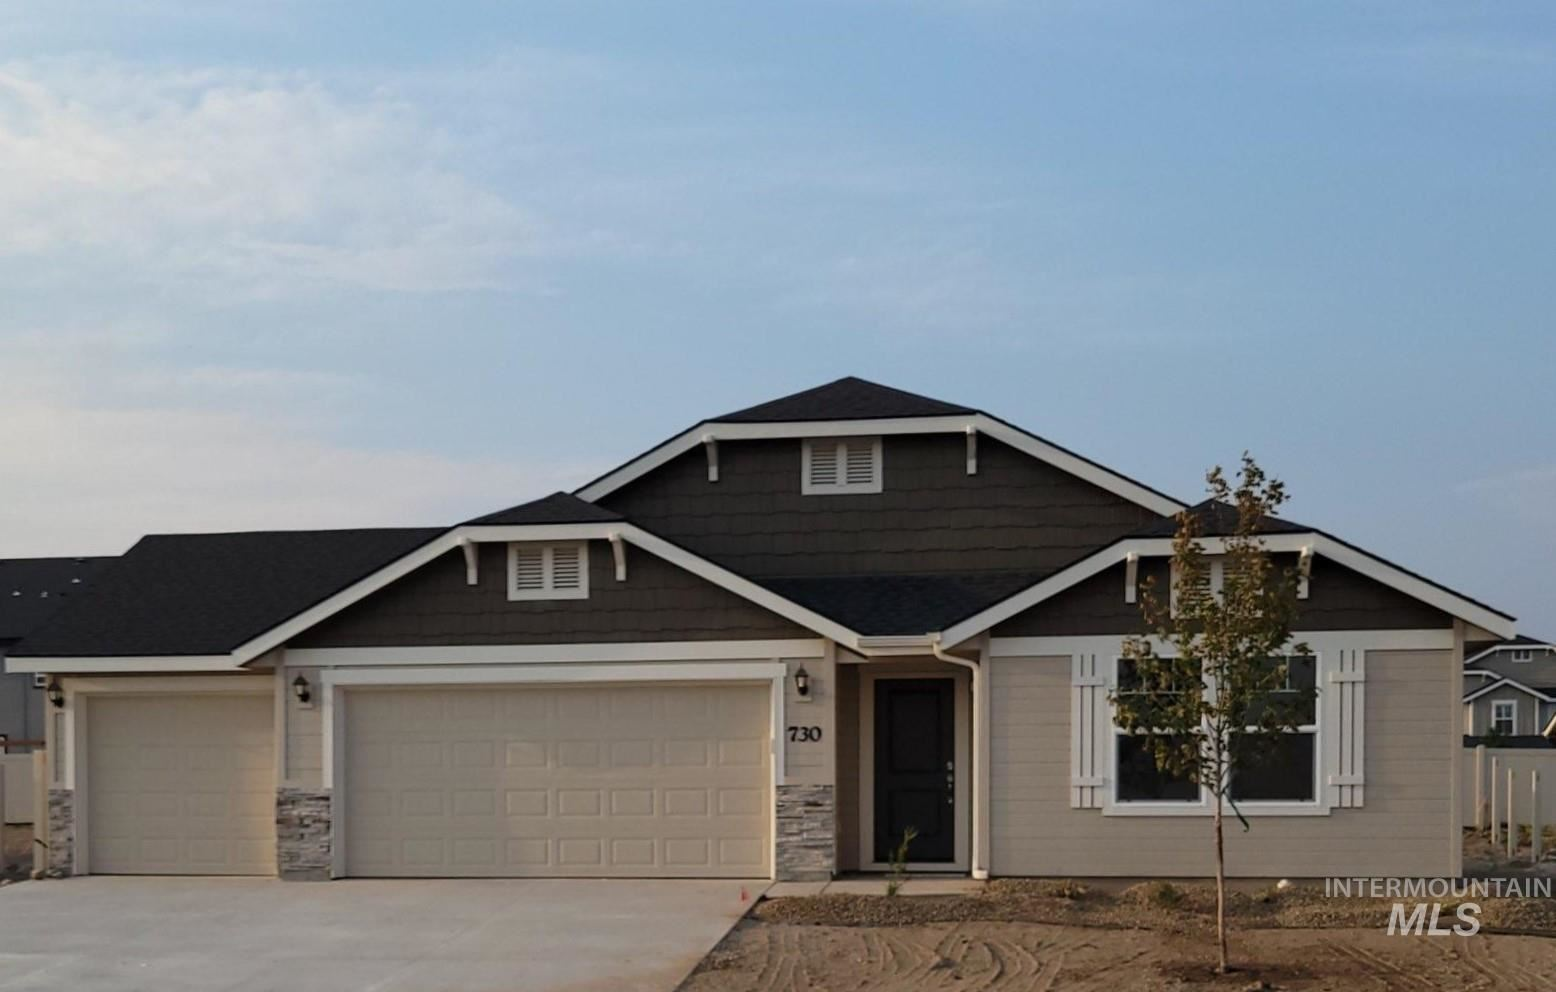 730 SW Raelynn St., Mountain Home, ID 83647 - MLS#: 98810027